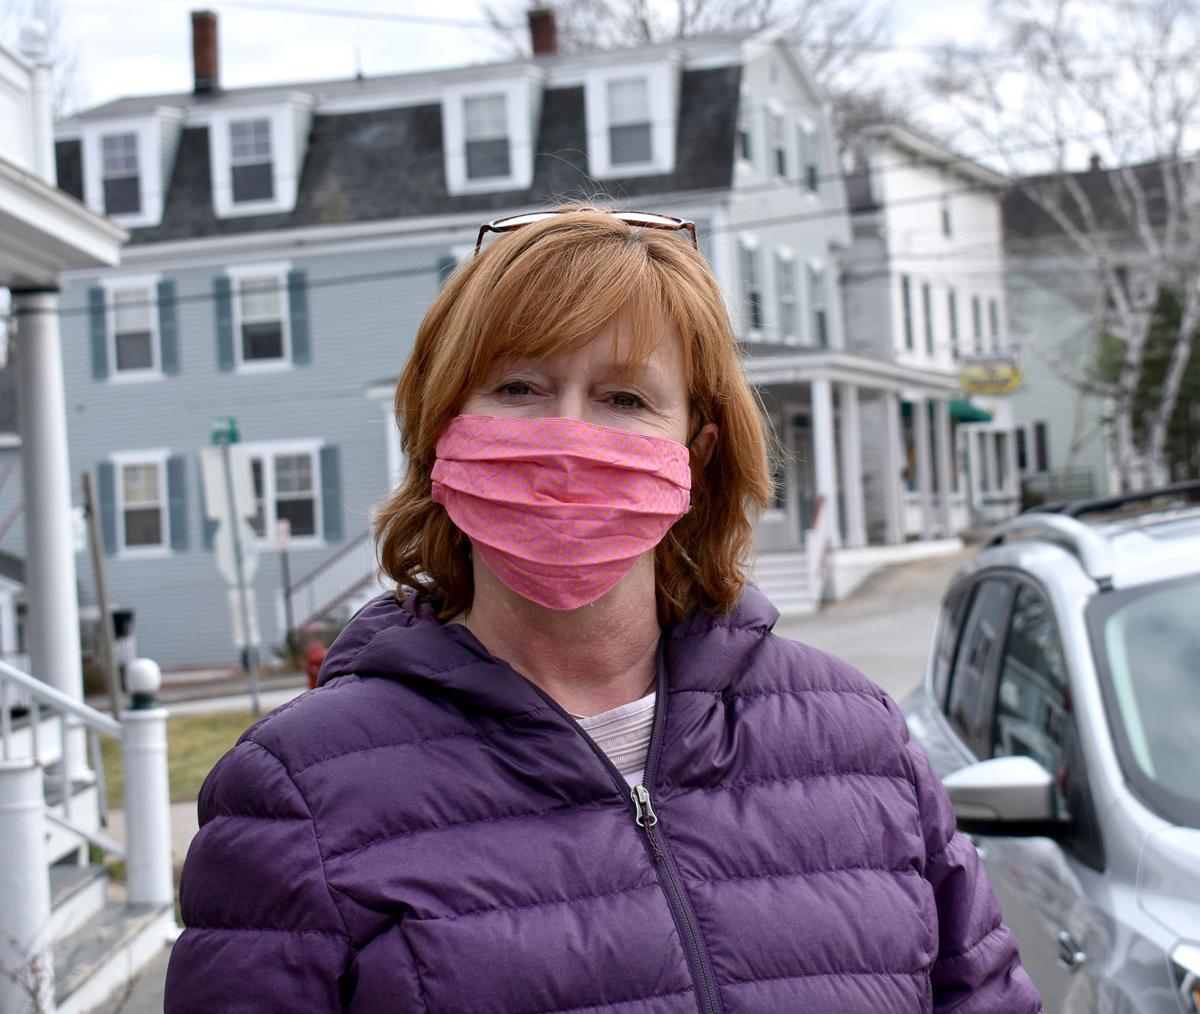 Melania Trump Demonstrates Importance of Face Masks to Slow Coronavirus Spread